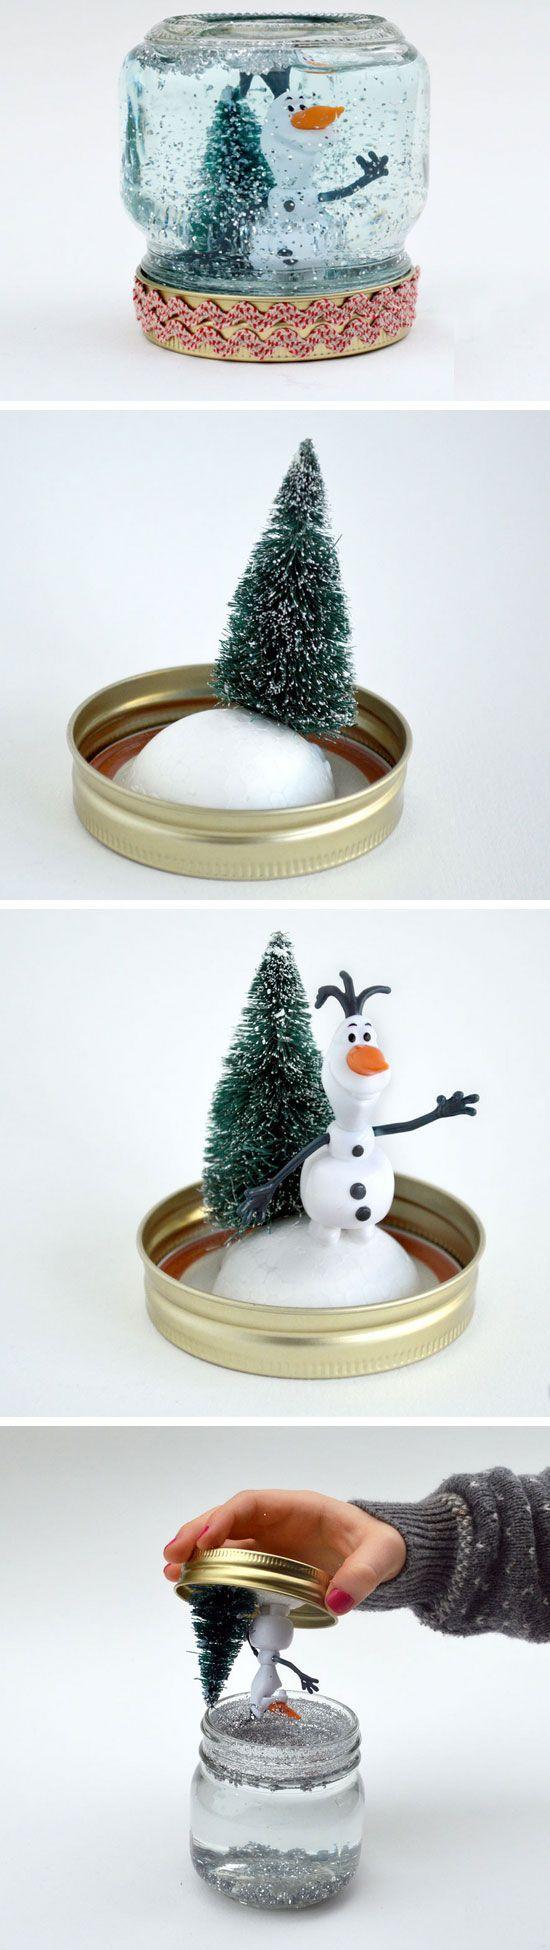 20 Easy Christmas Decor Ideas For Kids To Make How A Snow Globe